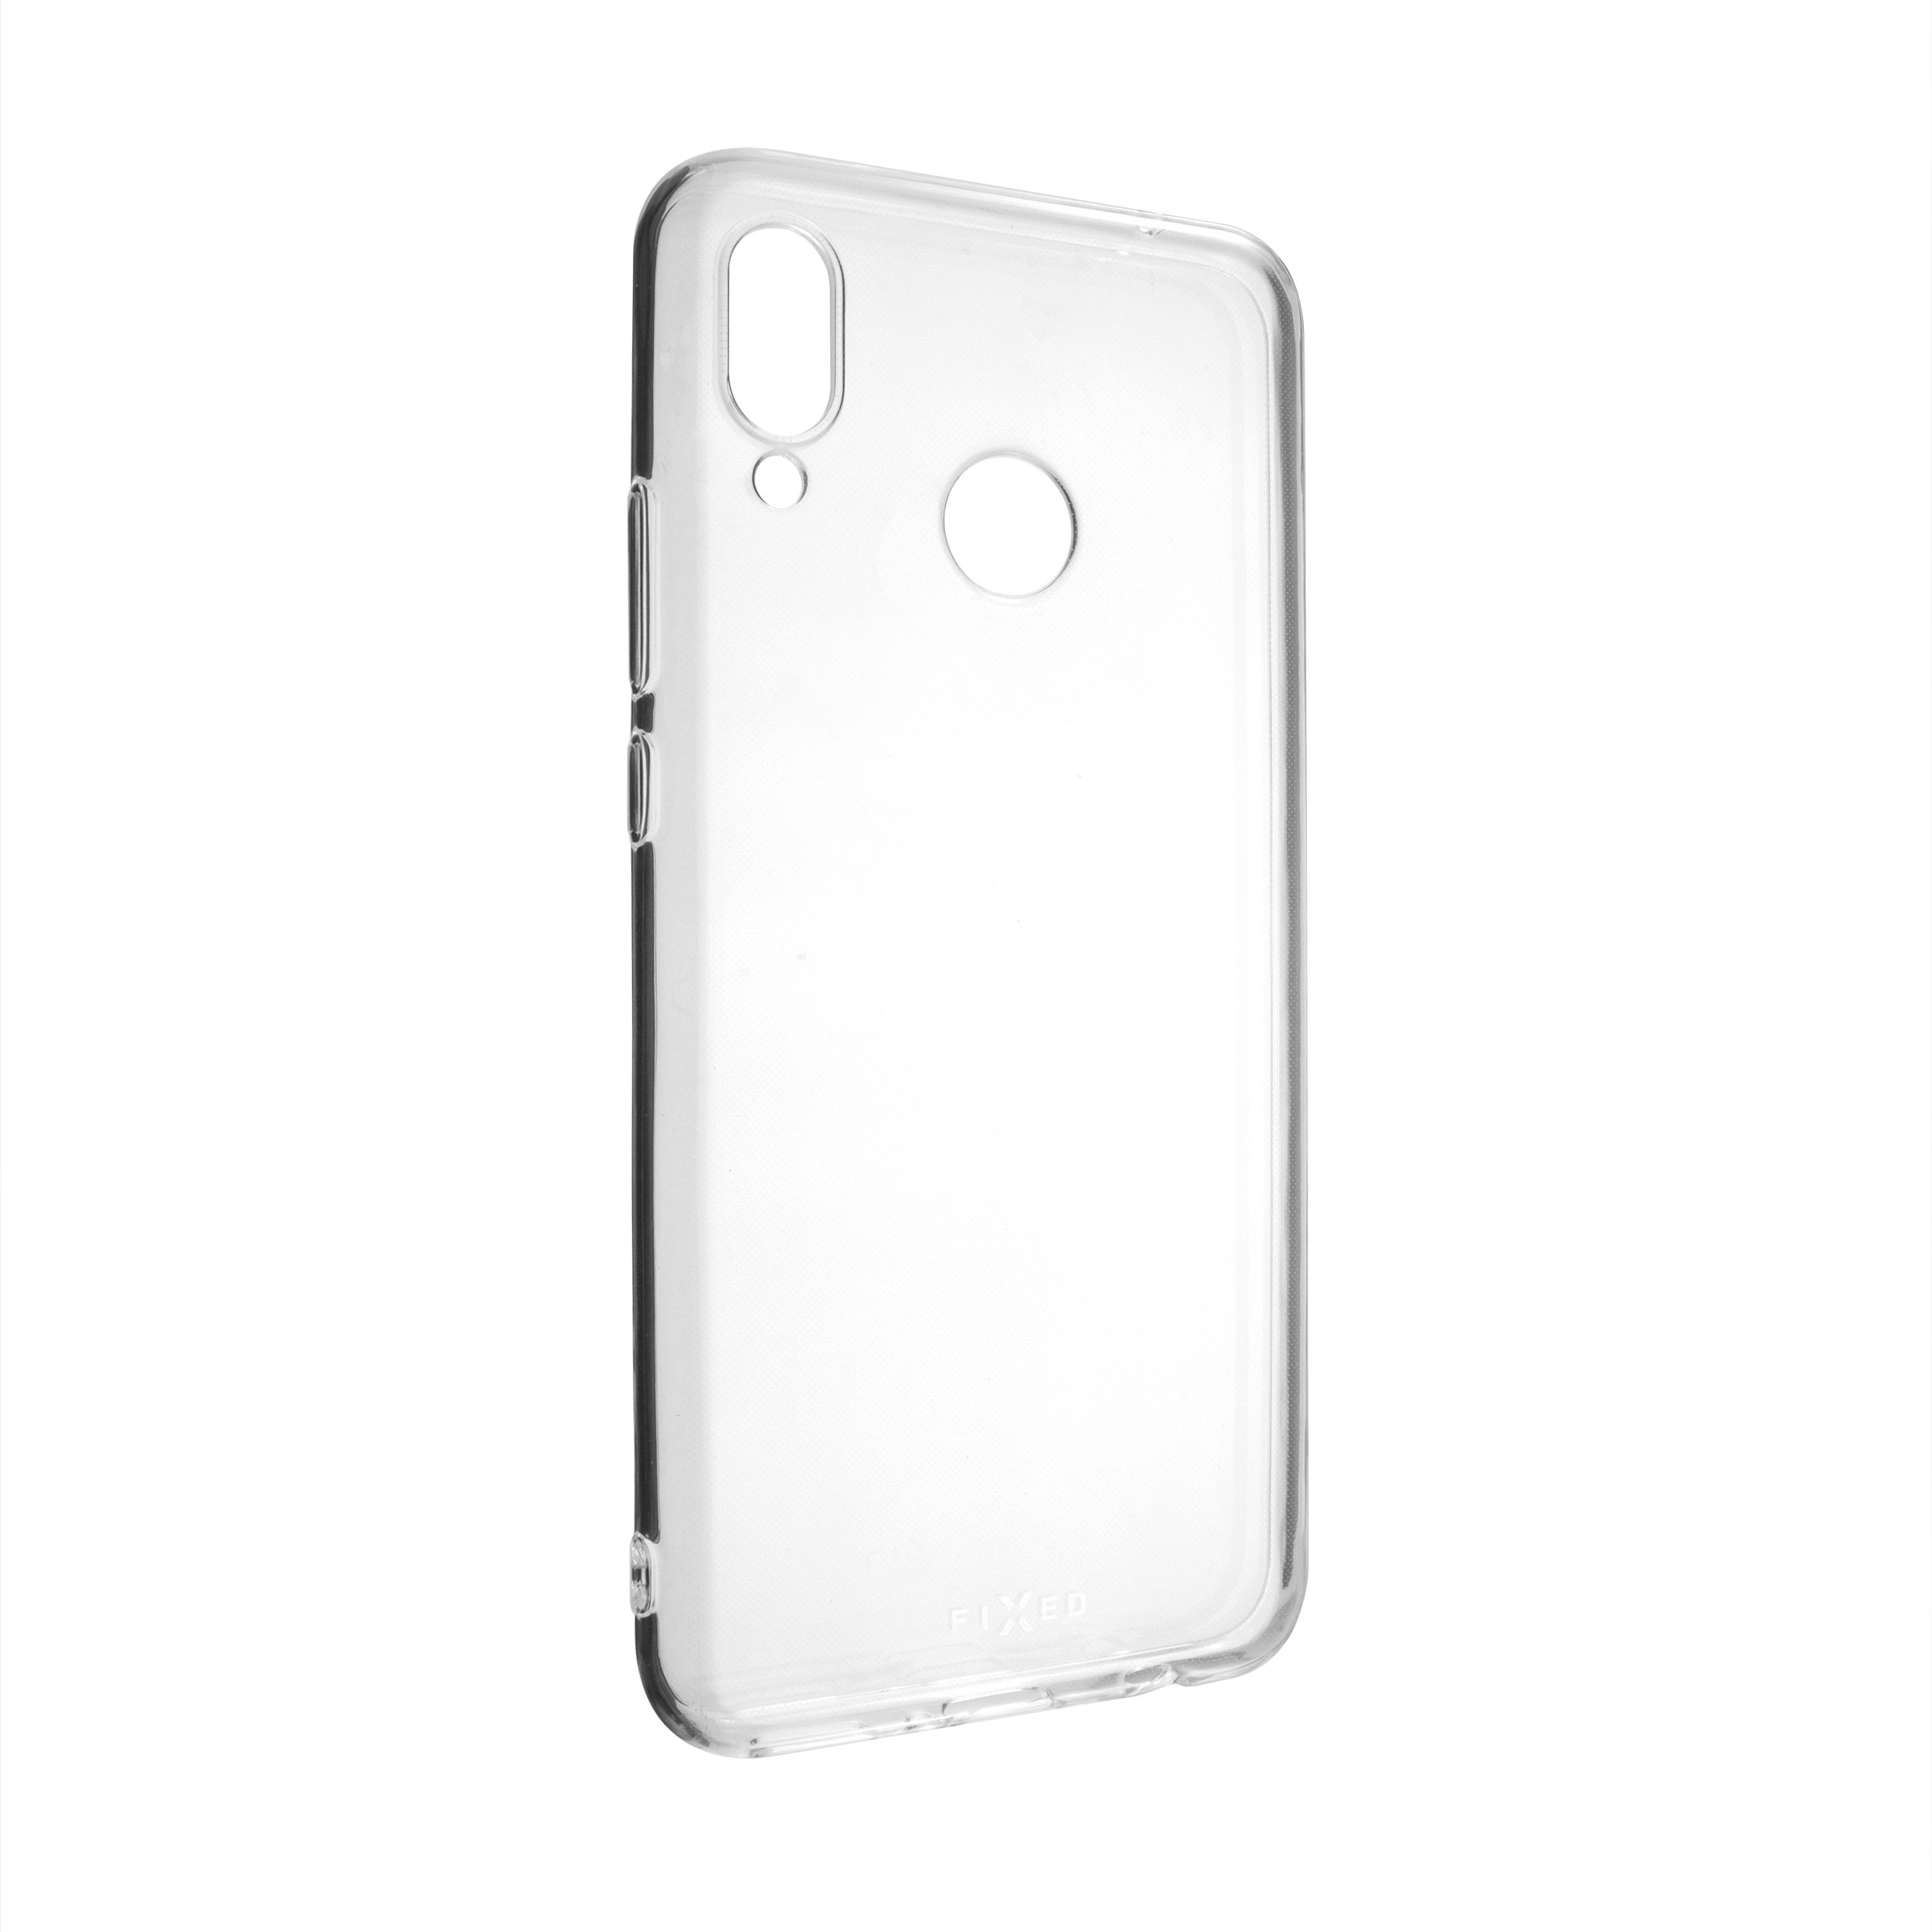 Ultratenké TPU gelové pouzdro FIXED Skin pro Huawei Nova 3, 0,6 mm, čiré